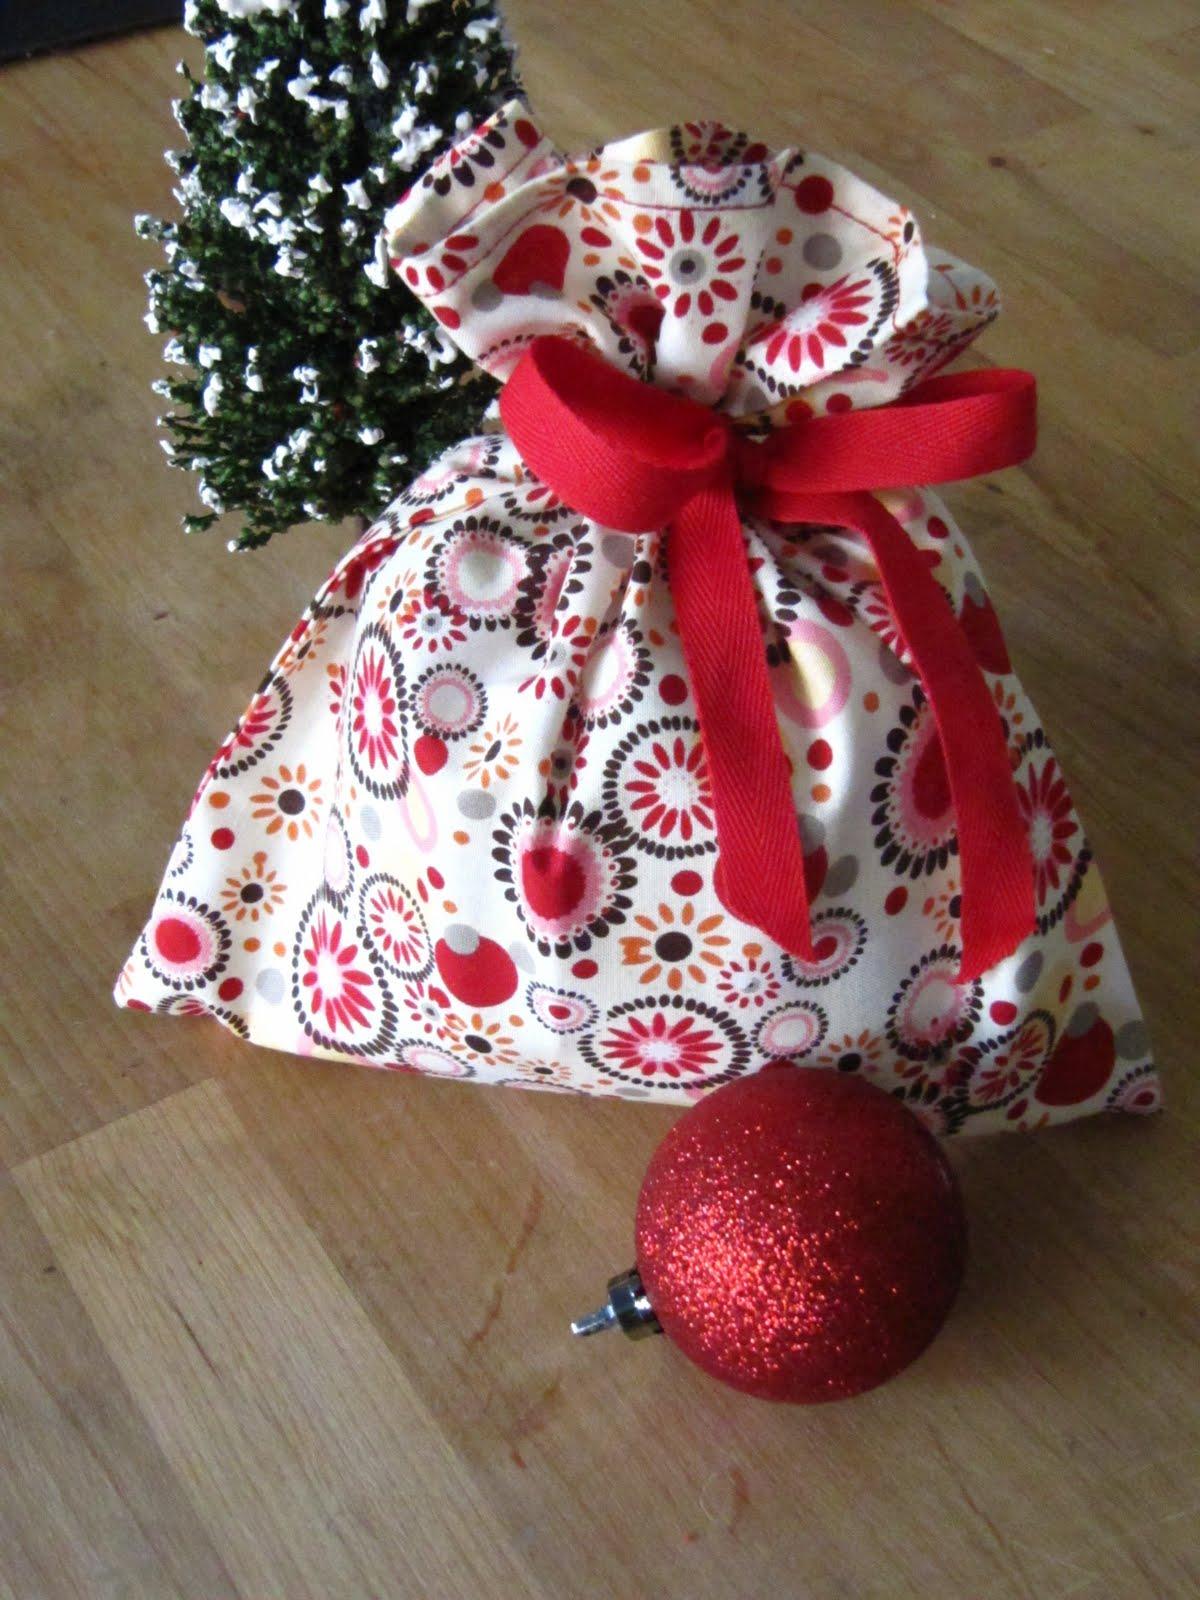 Sew Many Ways Tool Time TuesdayHandmade Fabric Gift